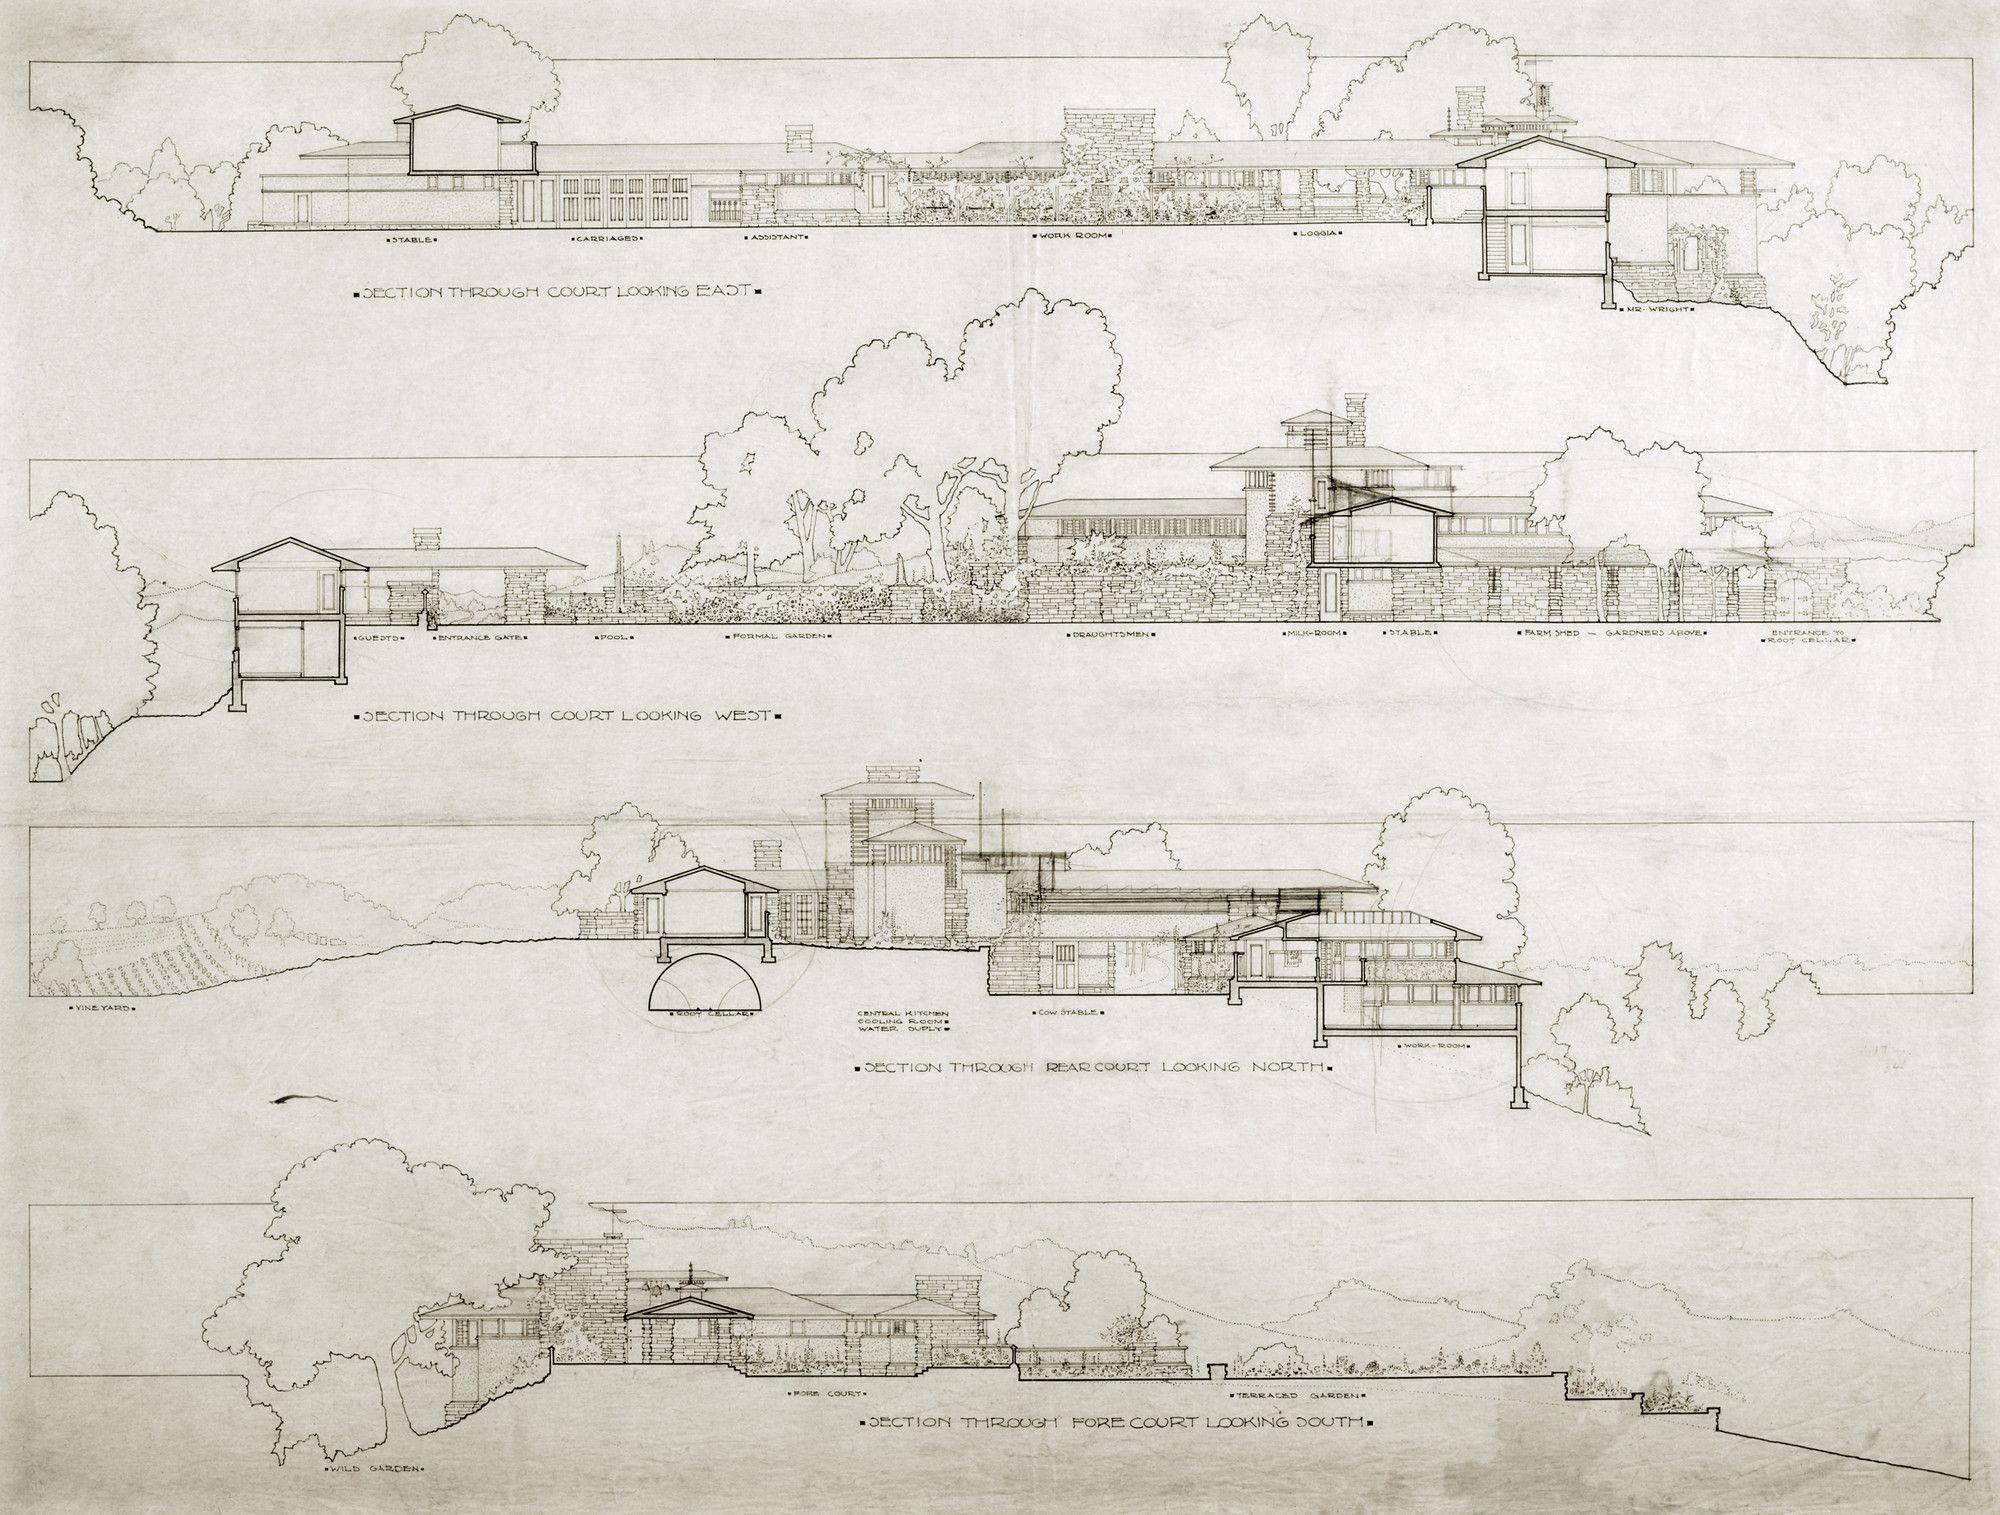 Frank Lloyd Wright Home & Studio, Taliesin II, Spring Green, WI ...